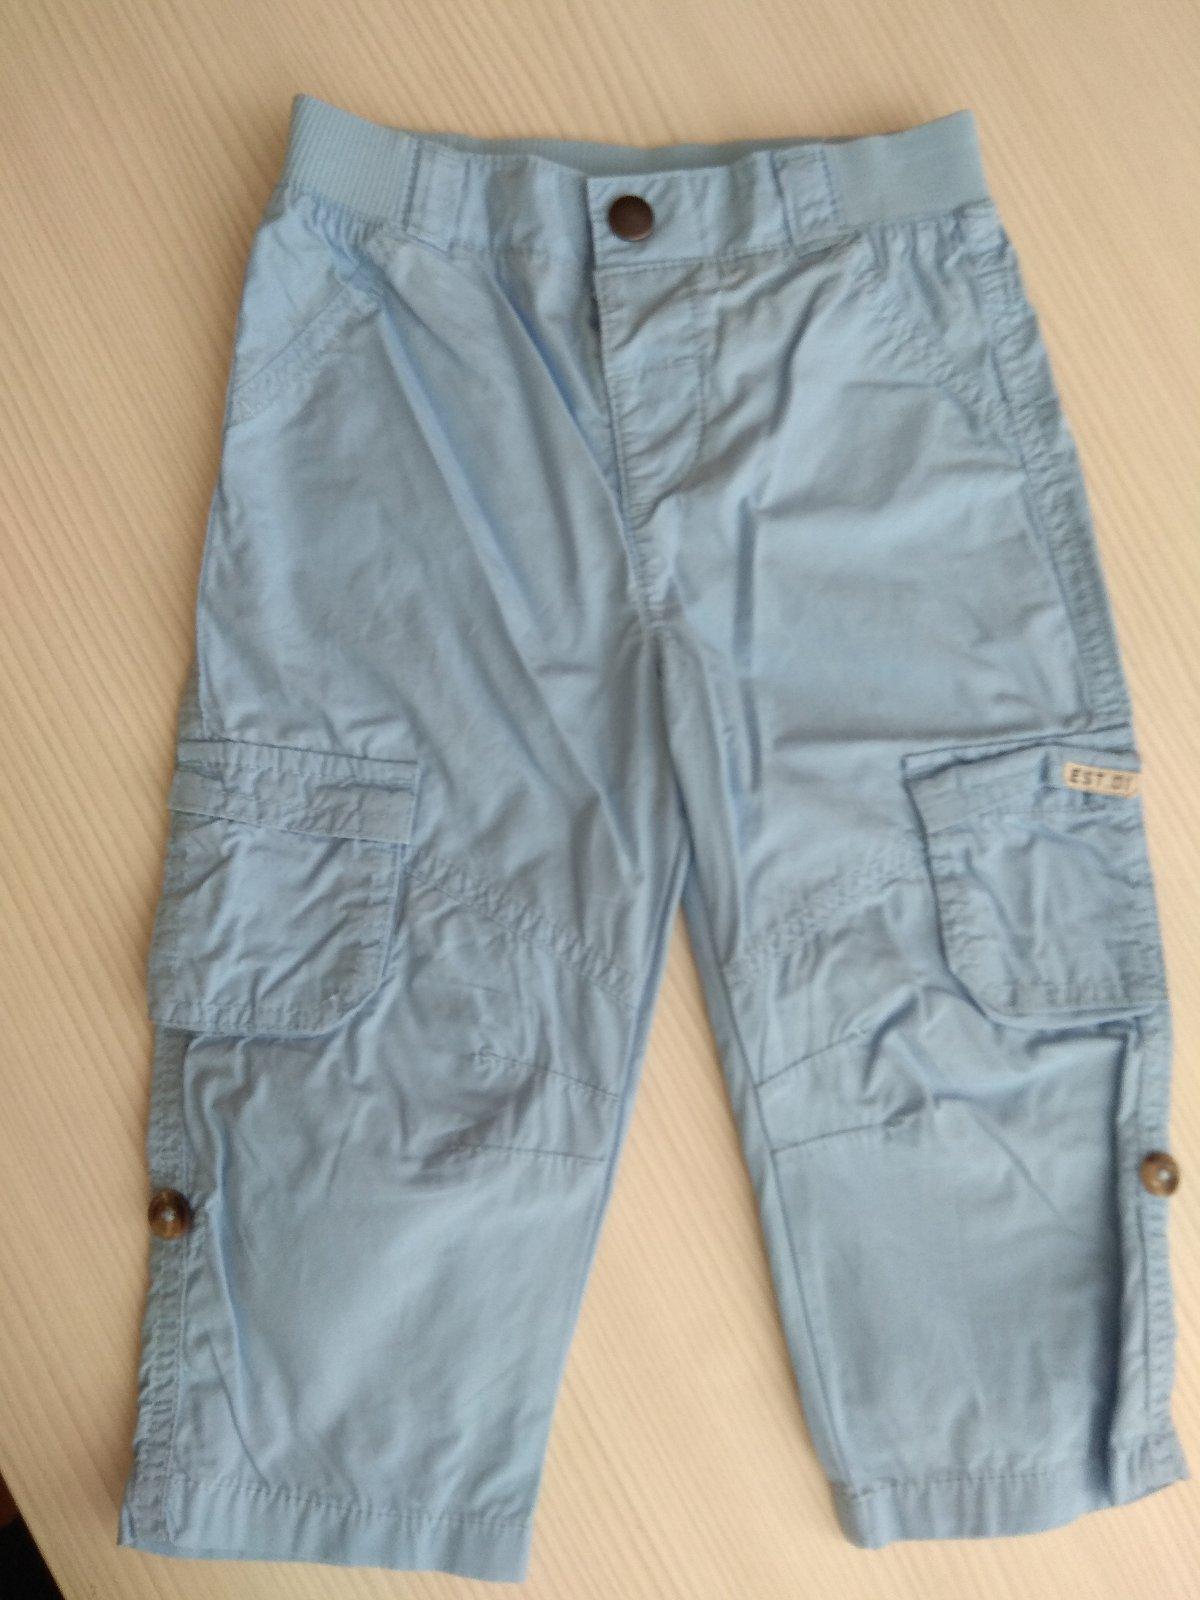 Modré tenké nohavice - Obrázok č. 2